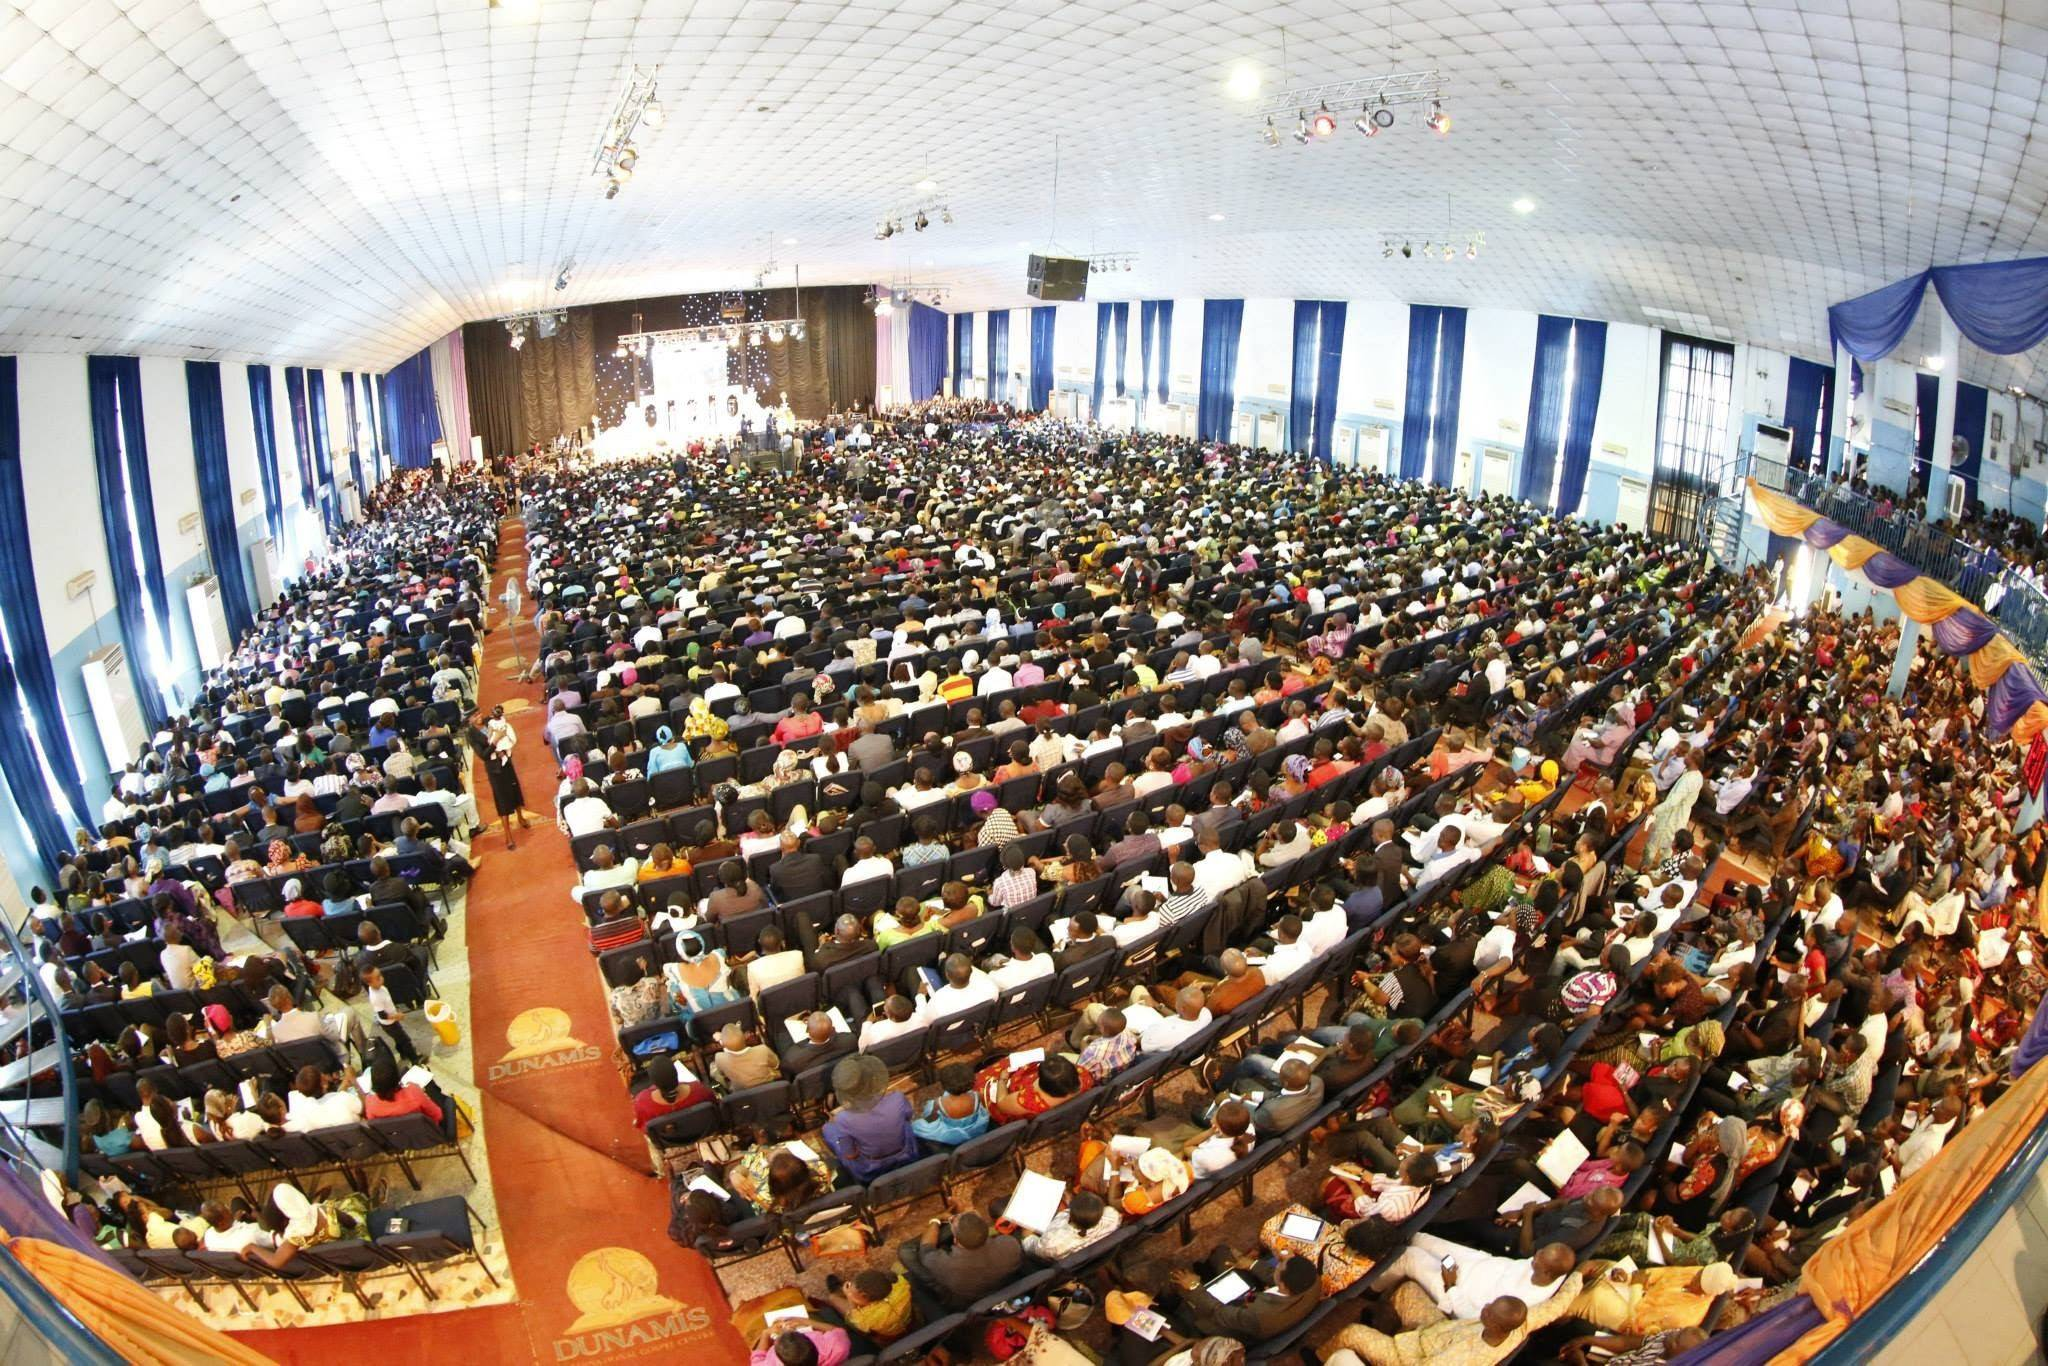 Dunamis International Gospel Centre, Abuja